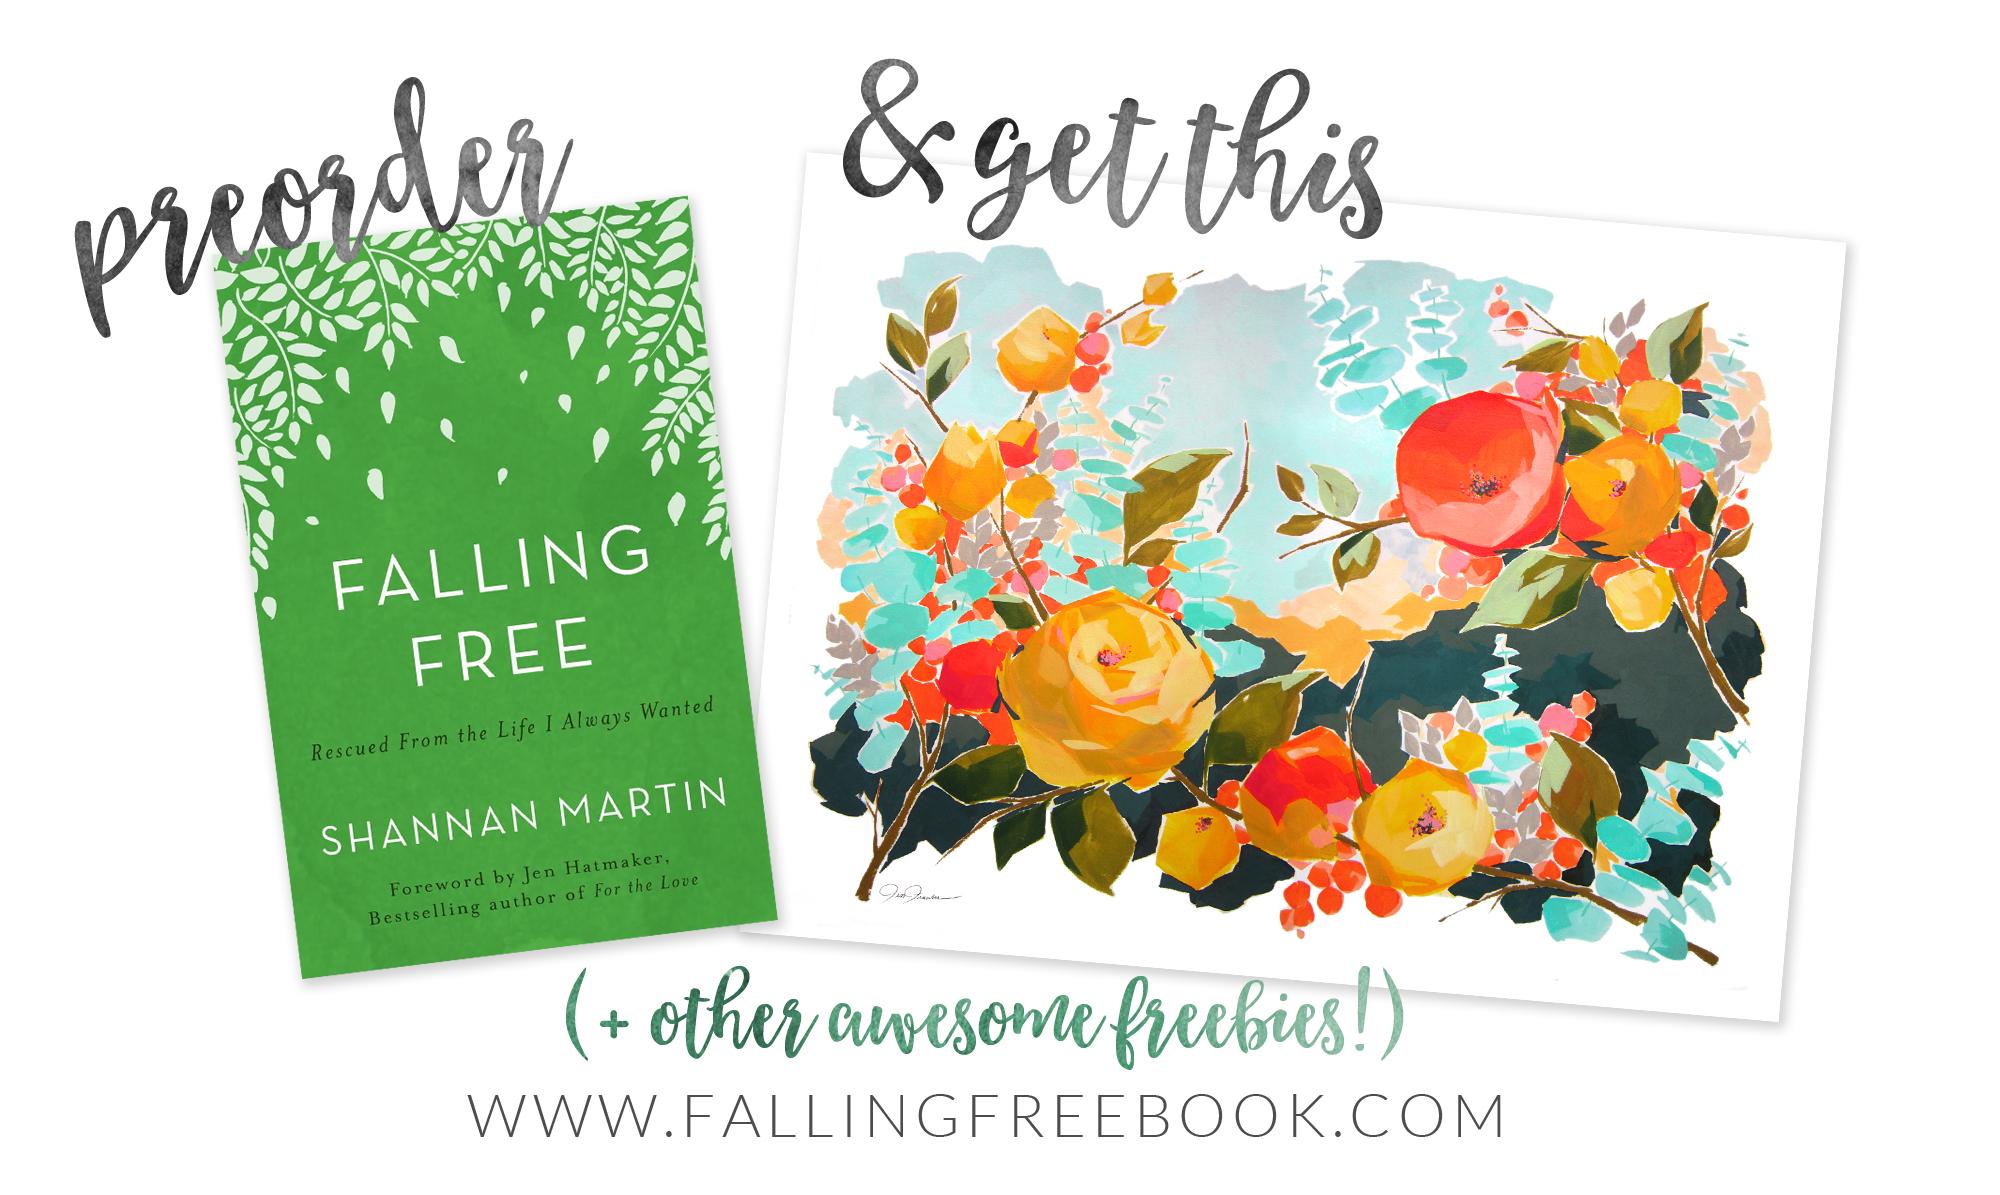 Preorder Falling Free & Get a free art print download